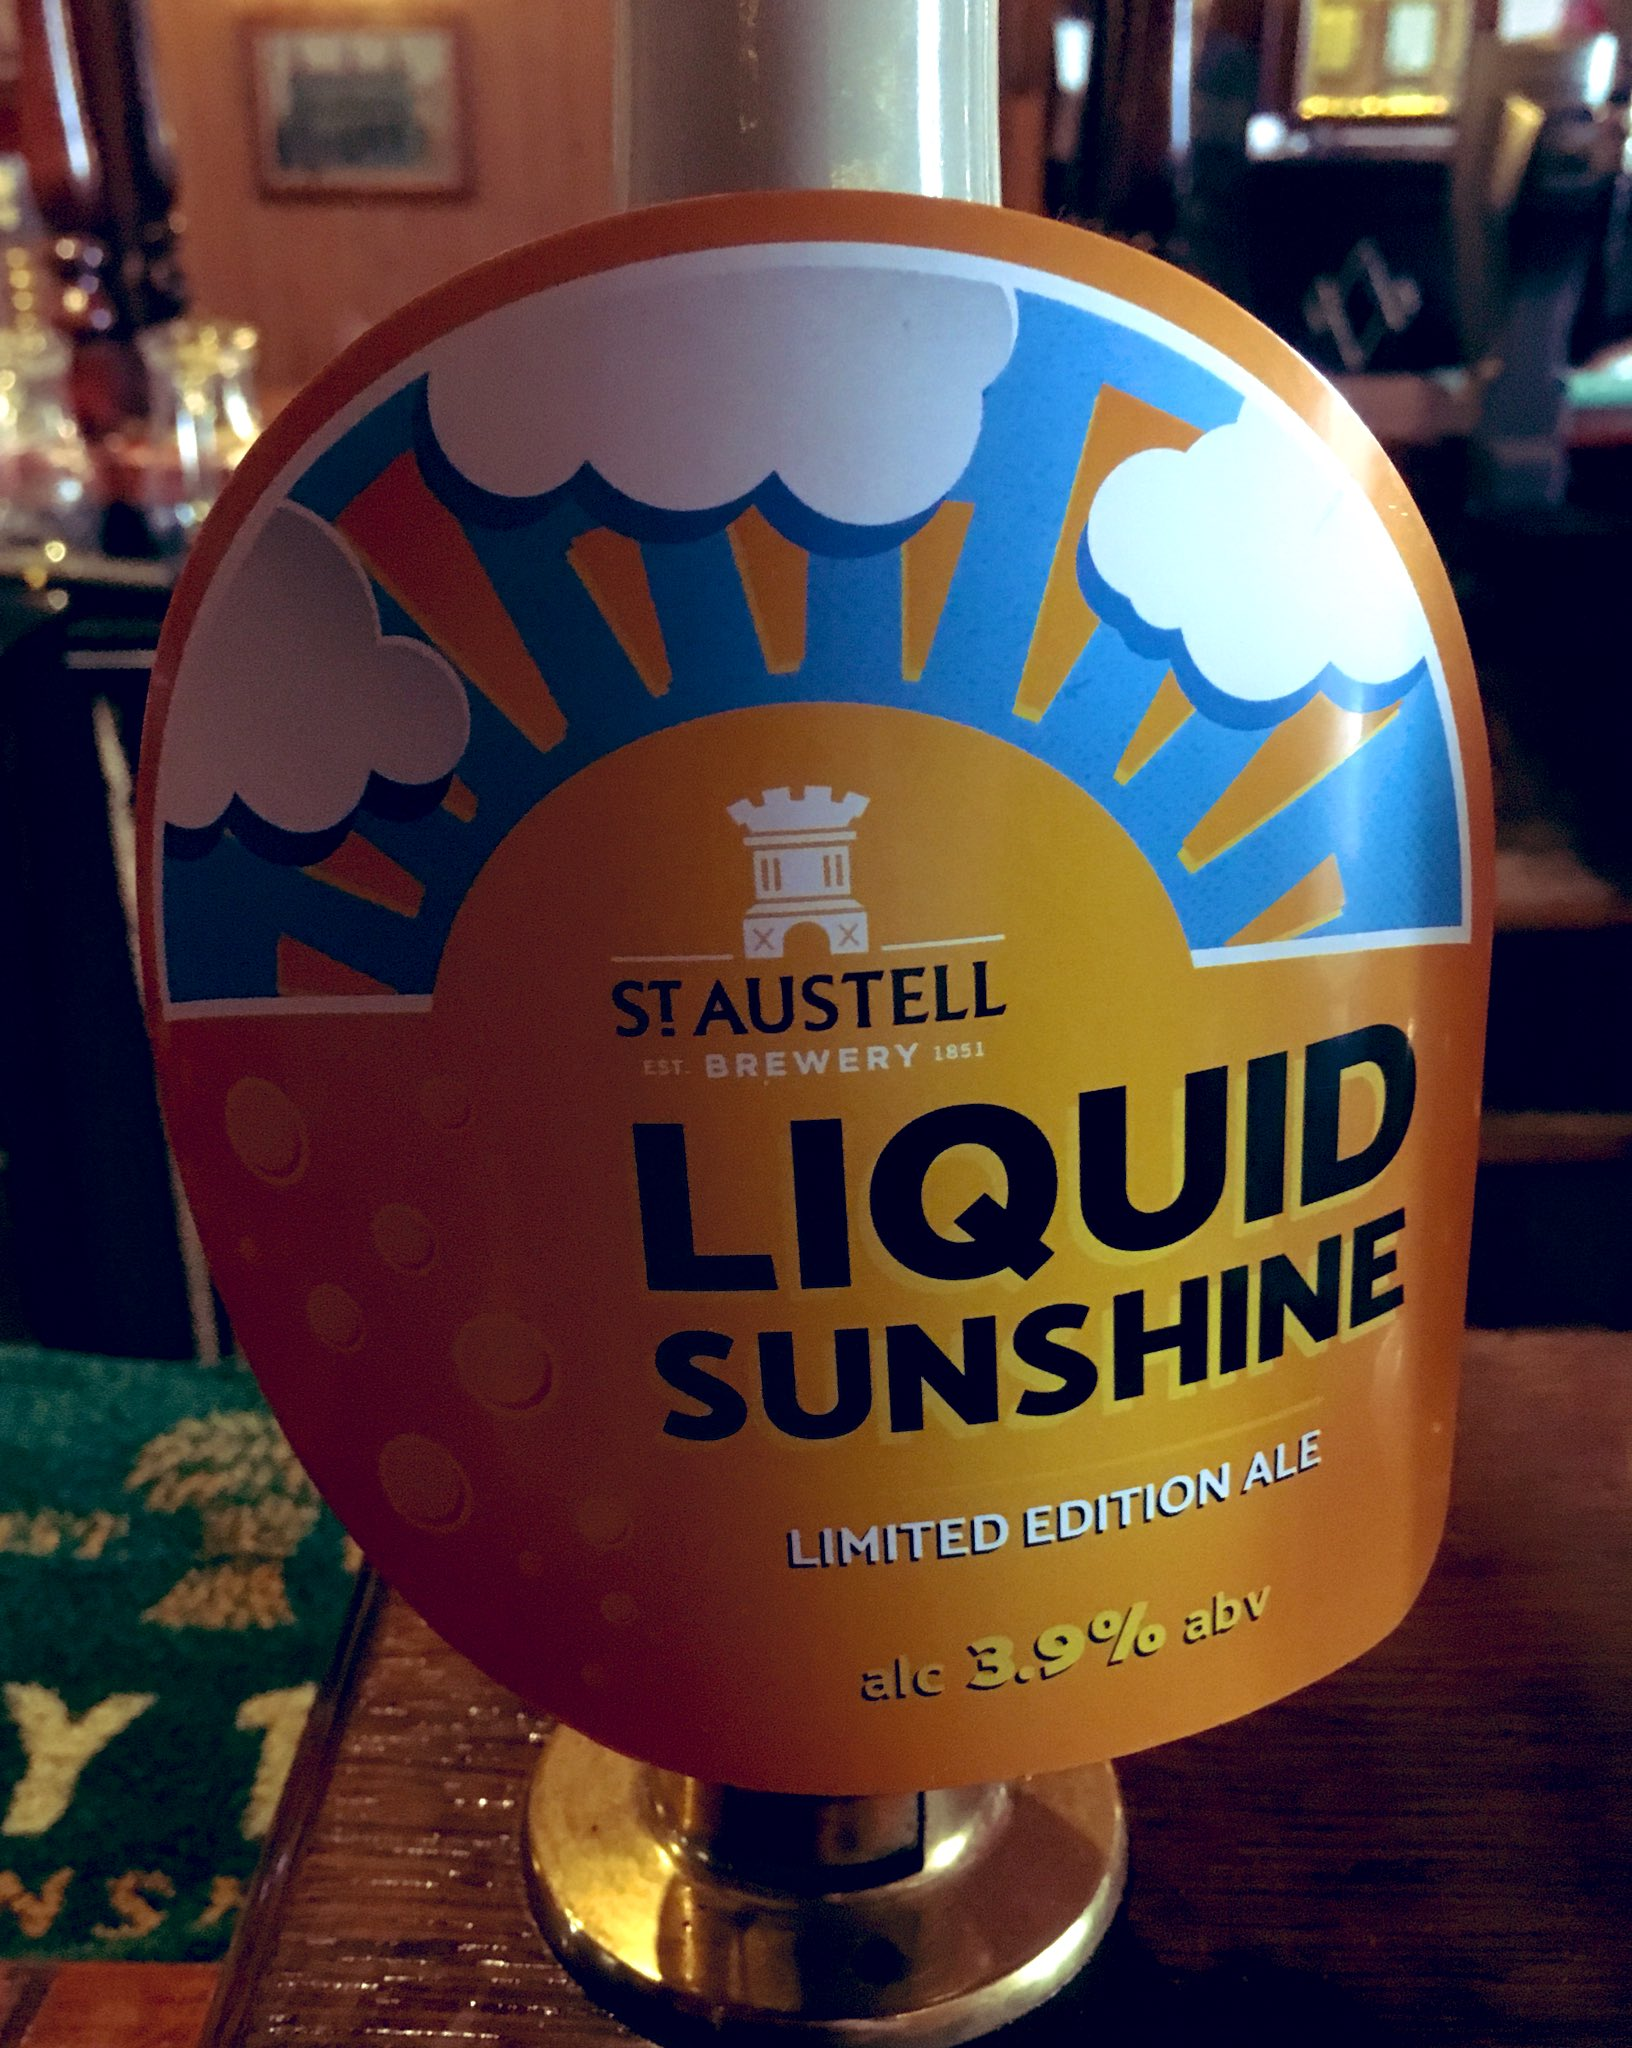 220: Liquid Sunshine